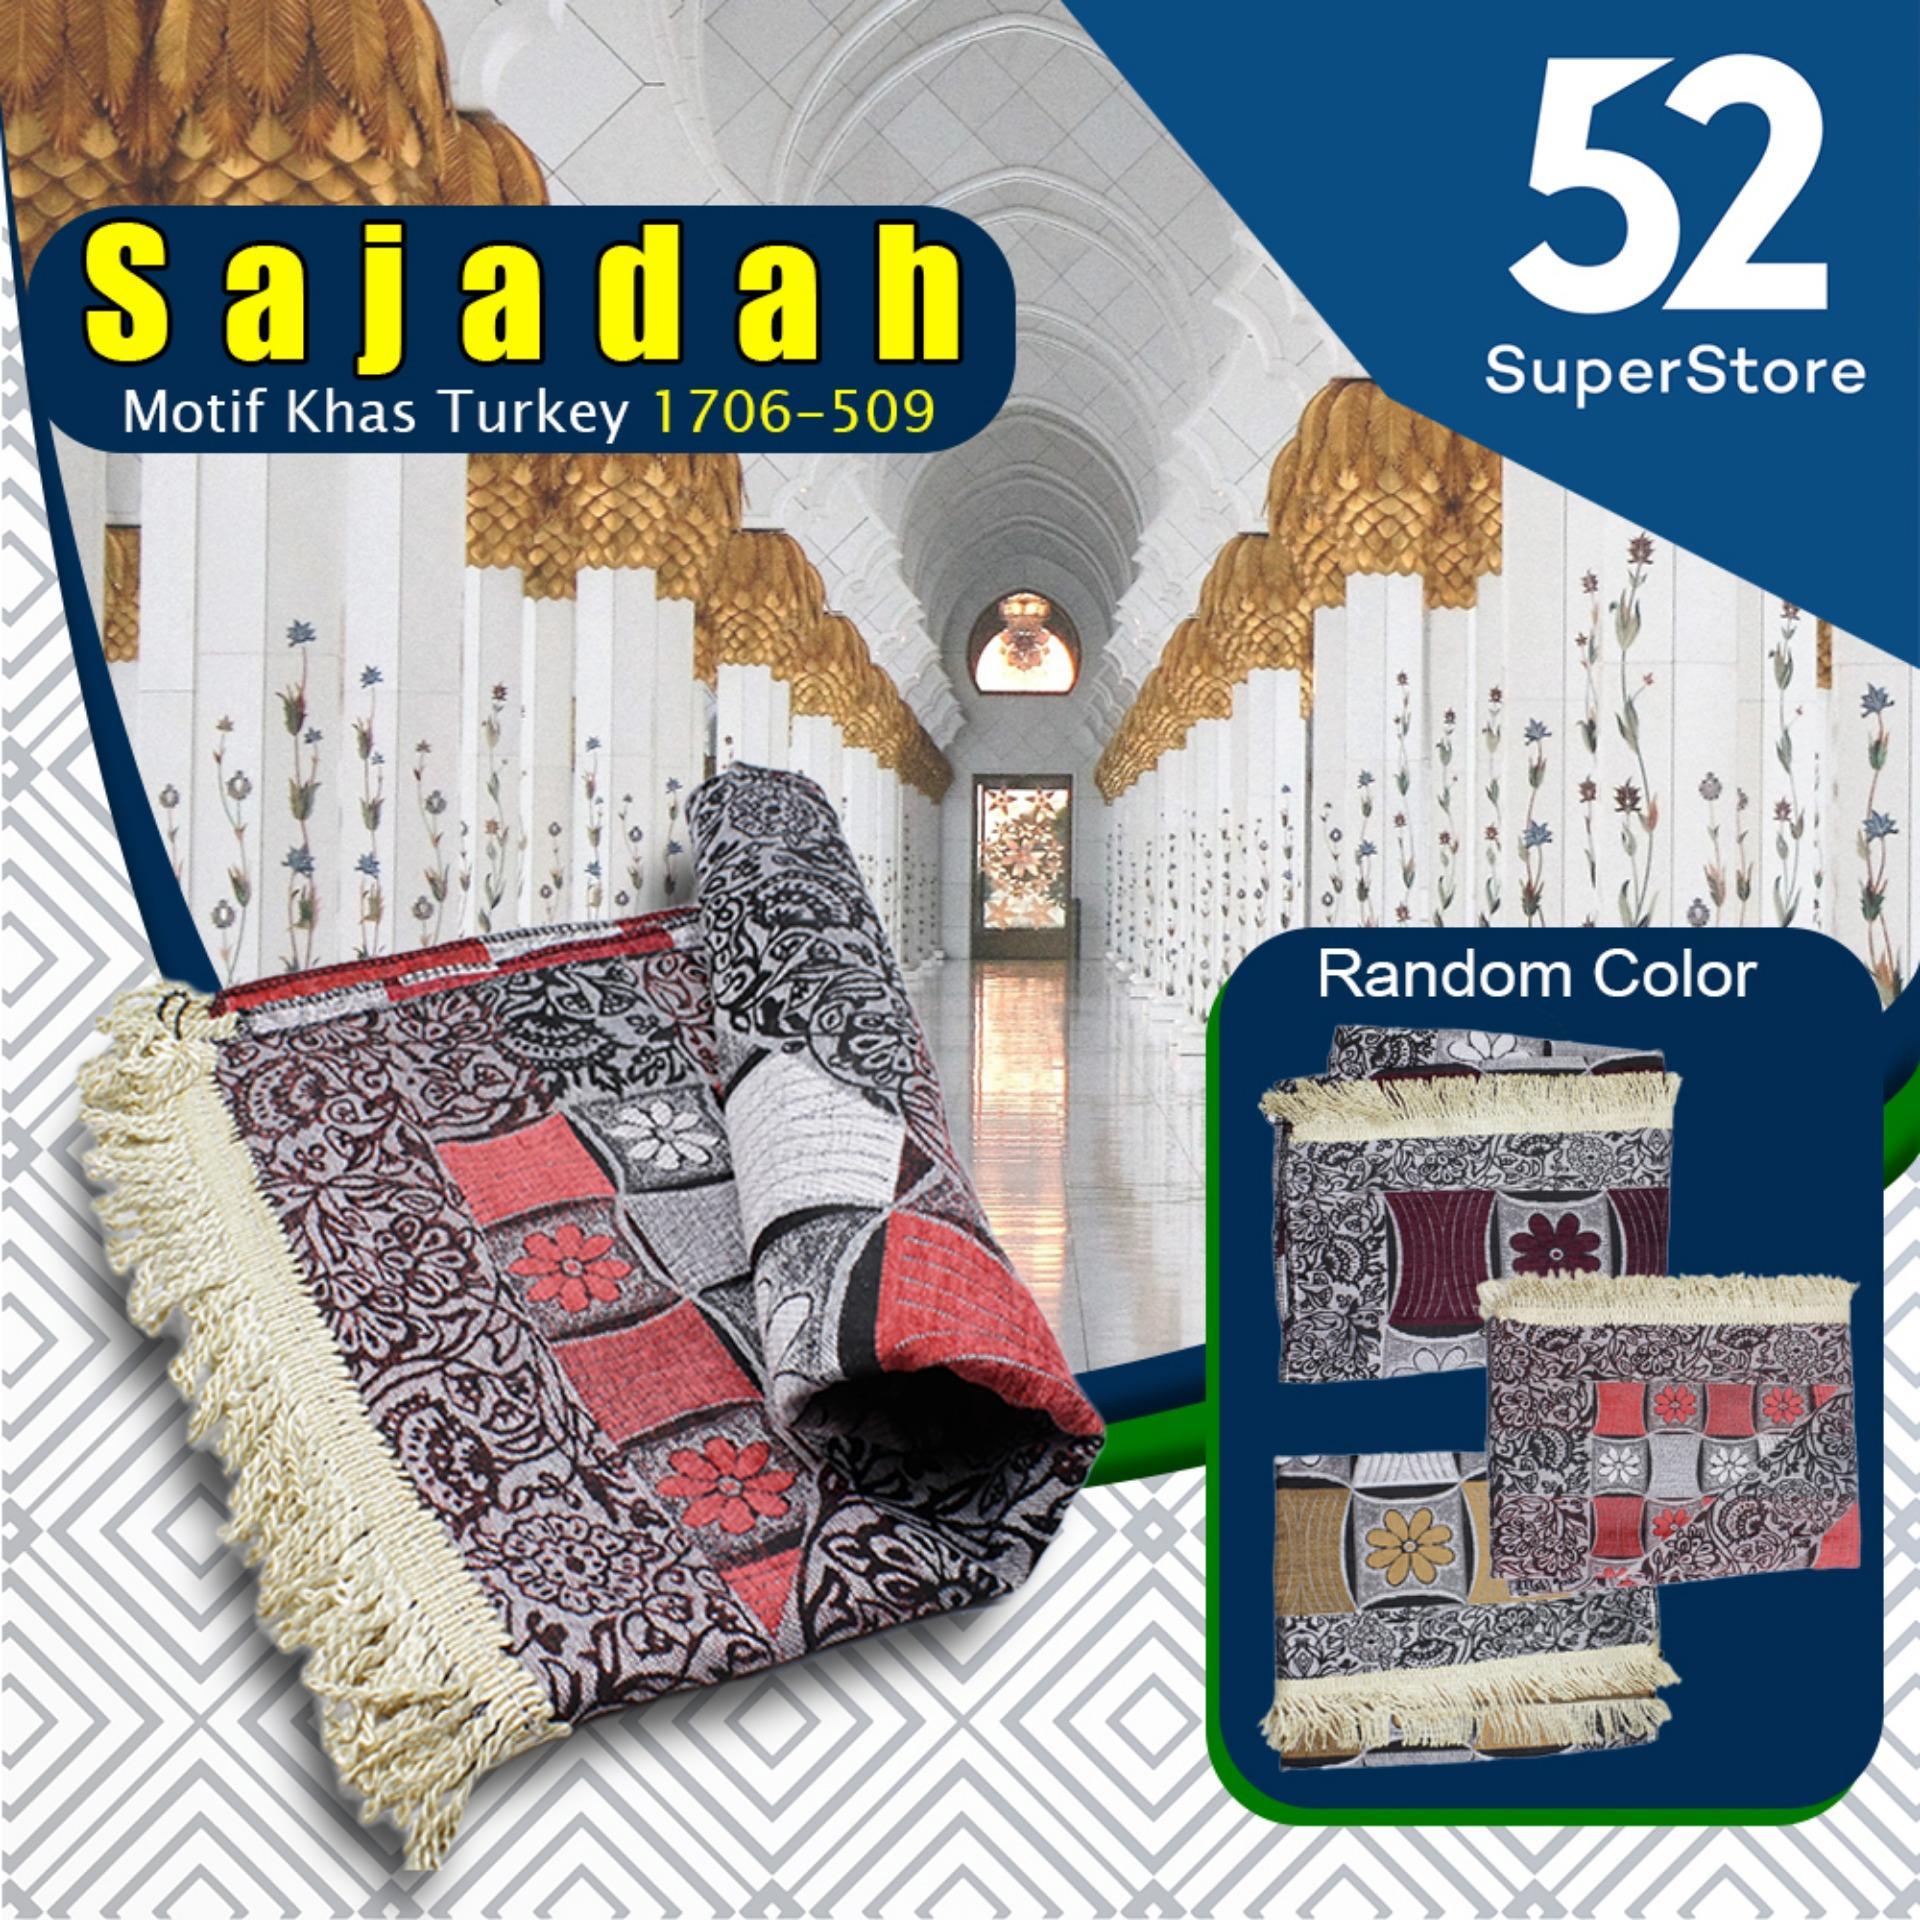 Buy Sell Cheapest Sajadah Kano Turkey Best Quality Product Deals Alydrus 52 Fashion Rajut Motif Khas 1706 509 Mix Color